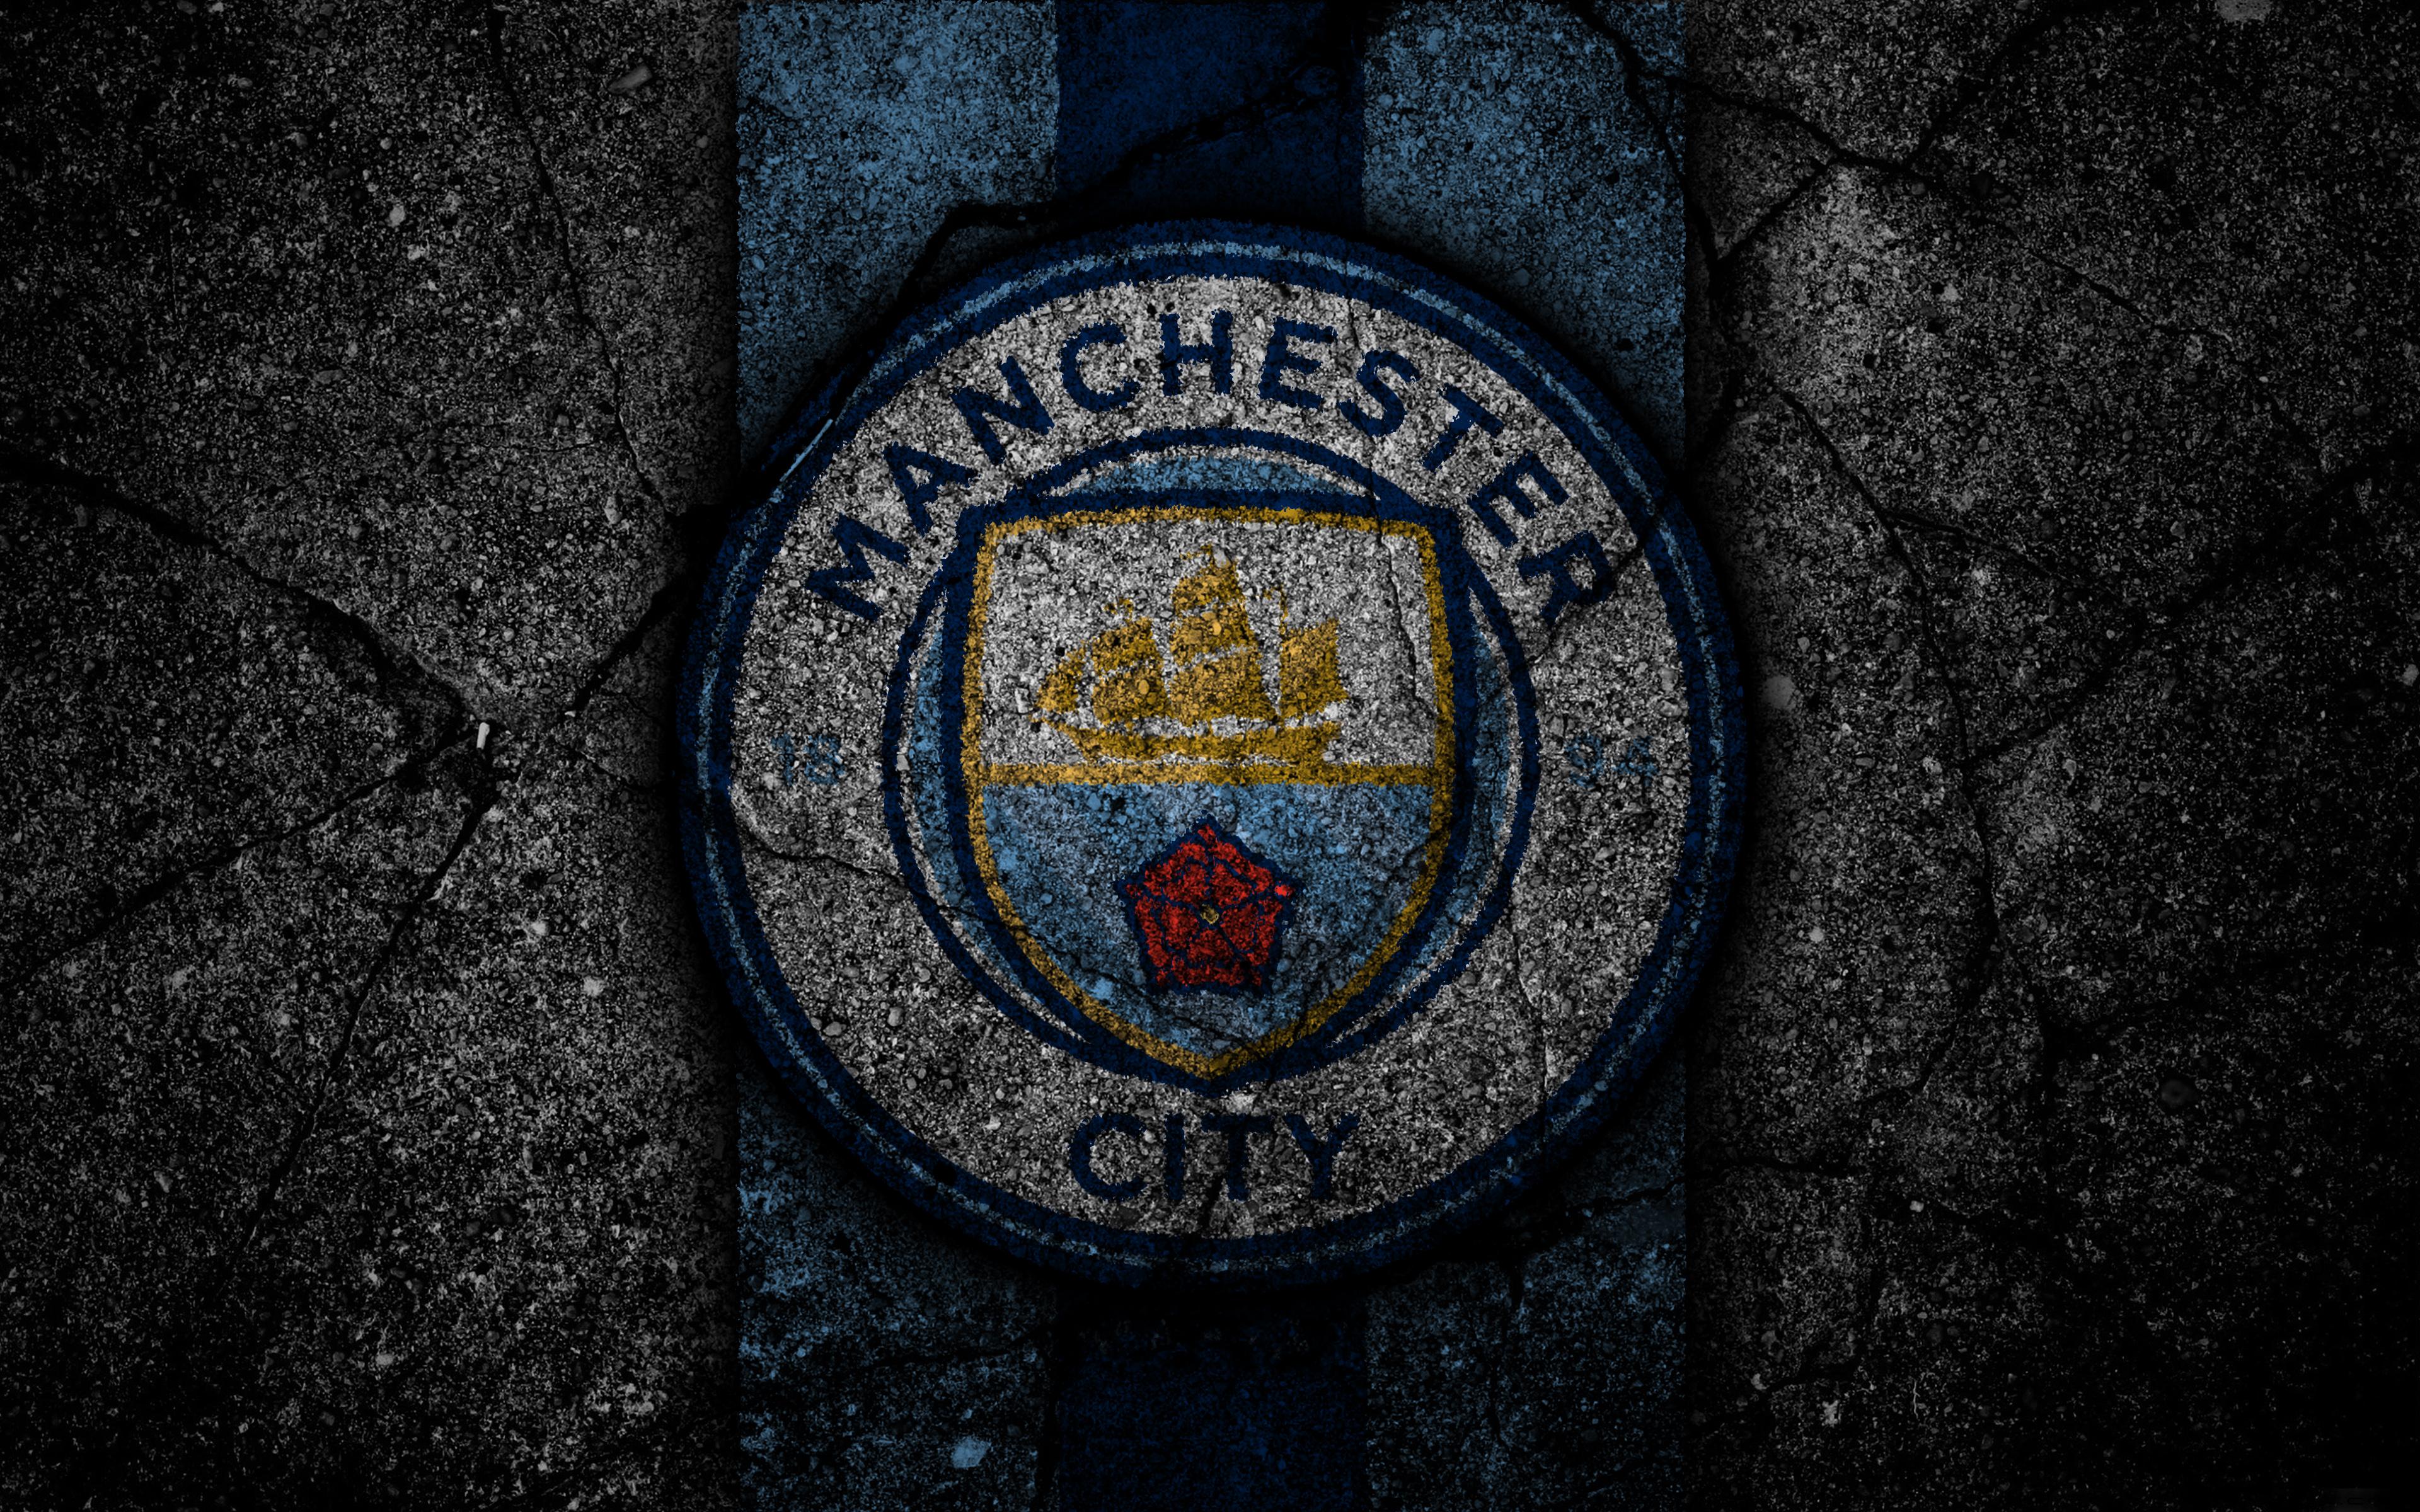 Manchester City Logo 4k Ultra Hd Wallpaper Background Image 3840x2400